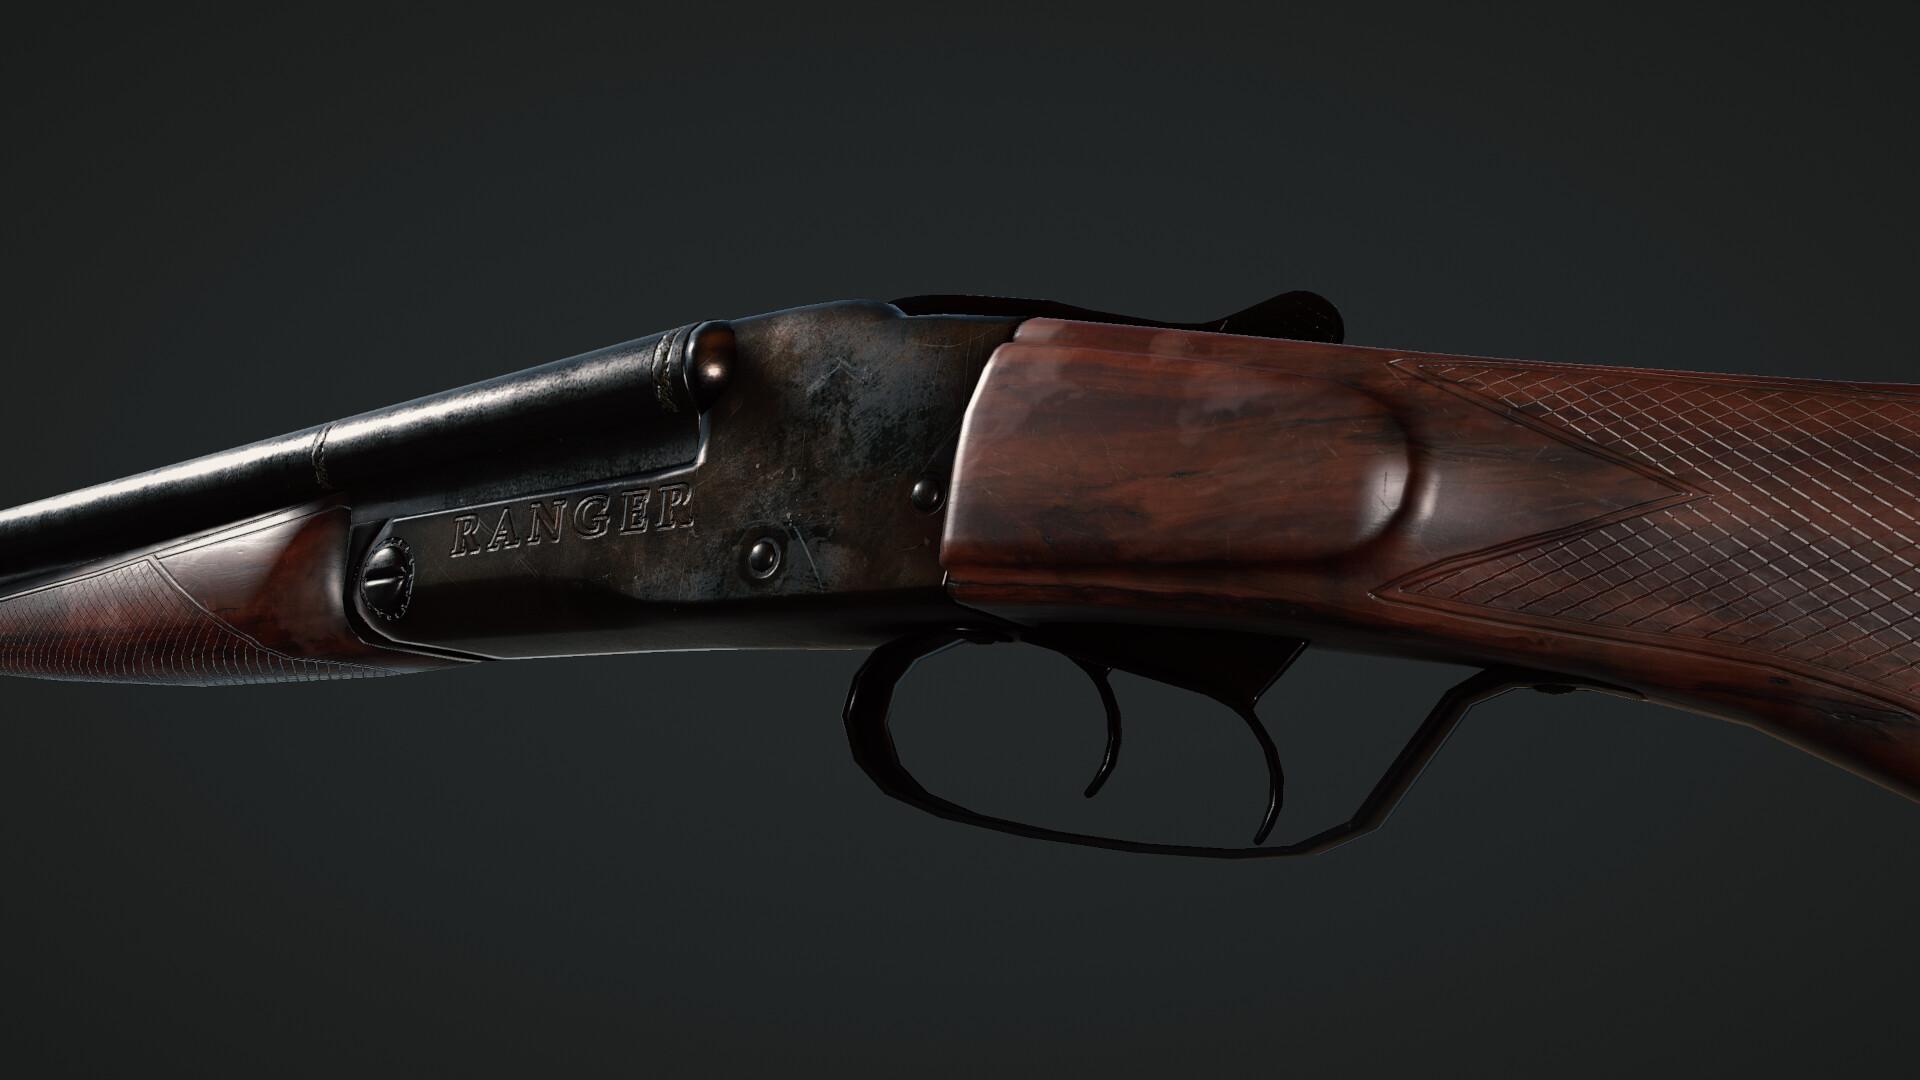 Jordan cameron ranger shotgun 9